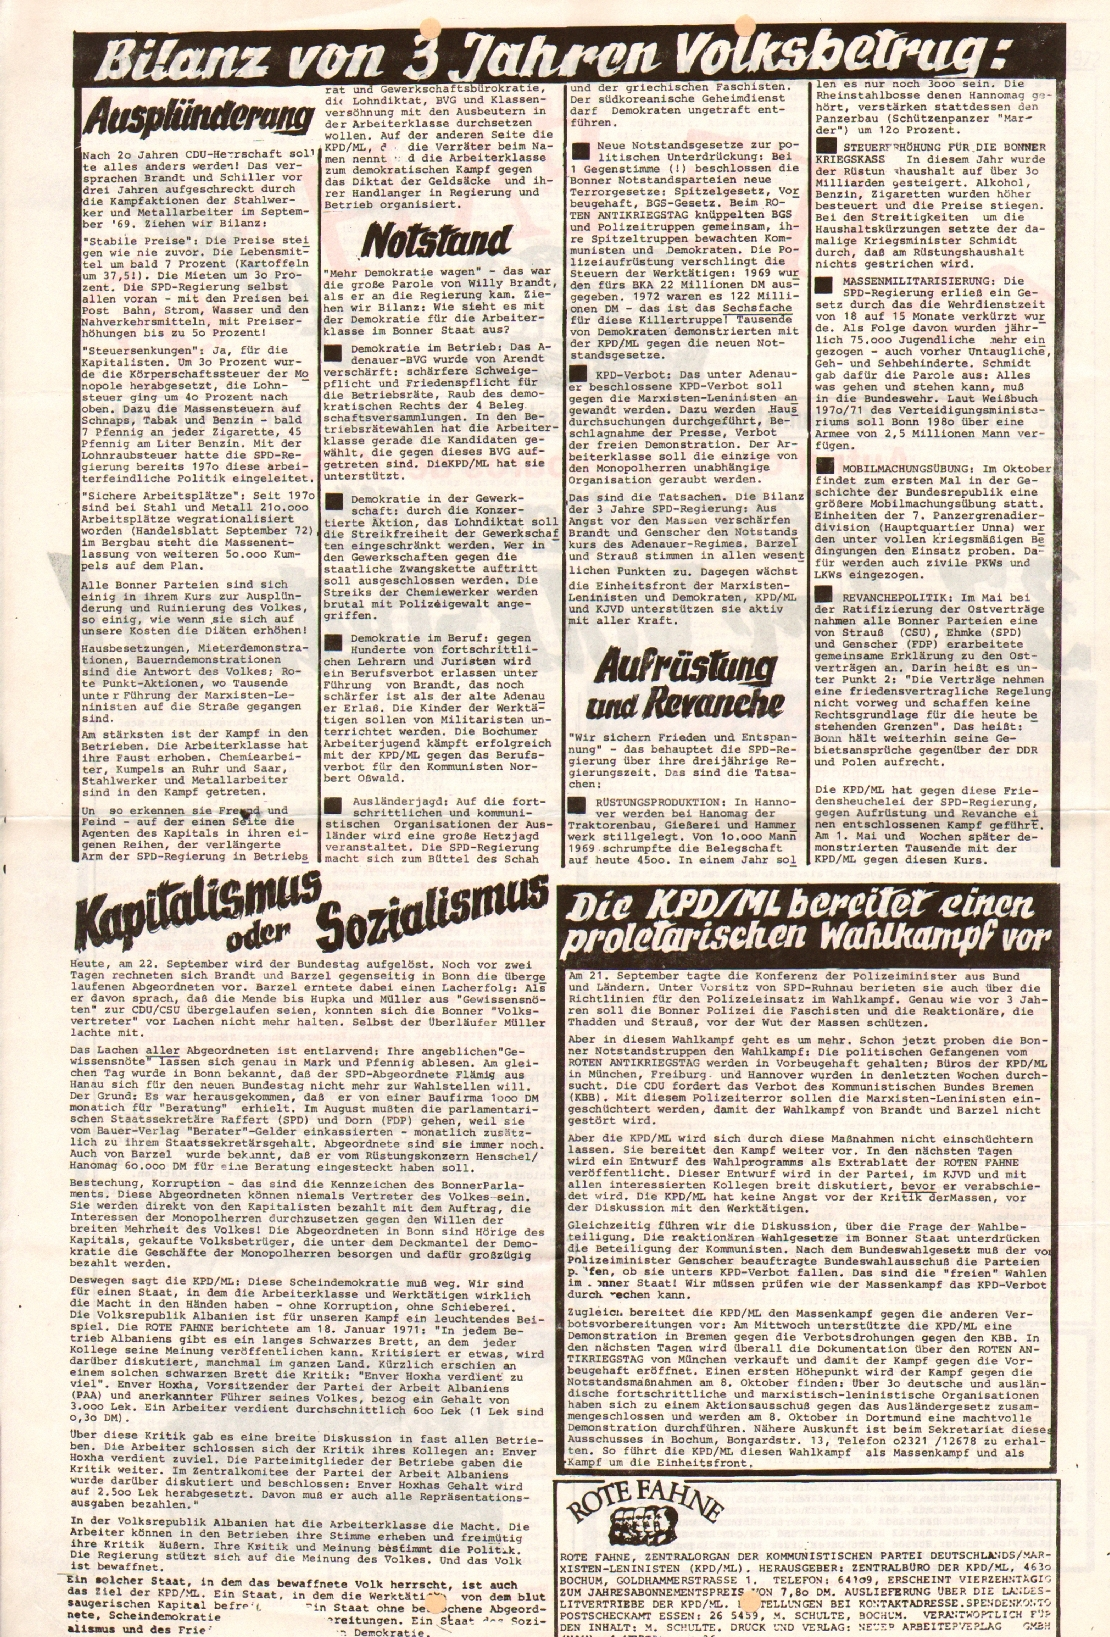 Rote Fahne, 3. Jg., September 1972, Extrablatt, Seite 2